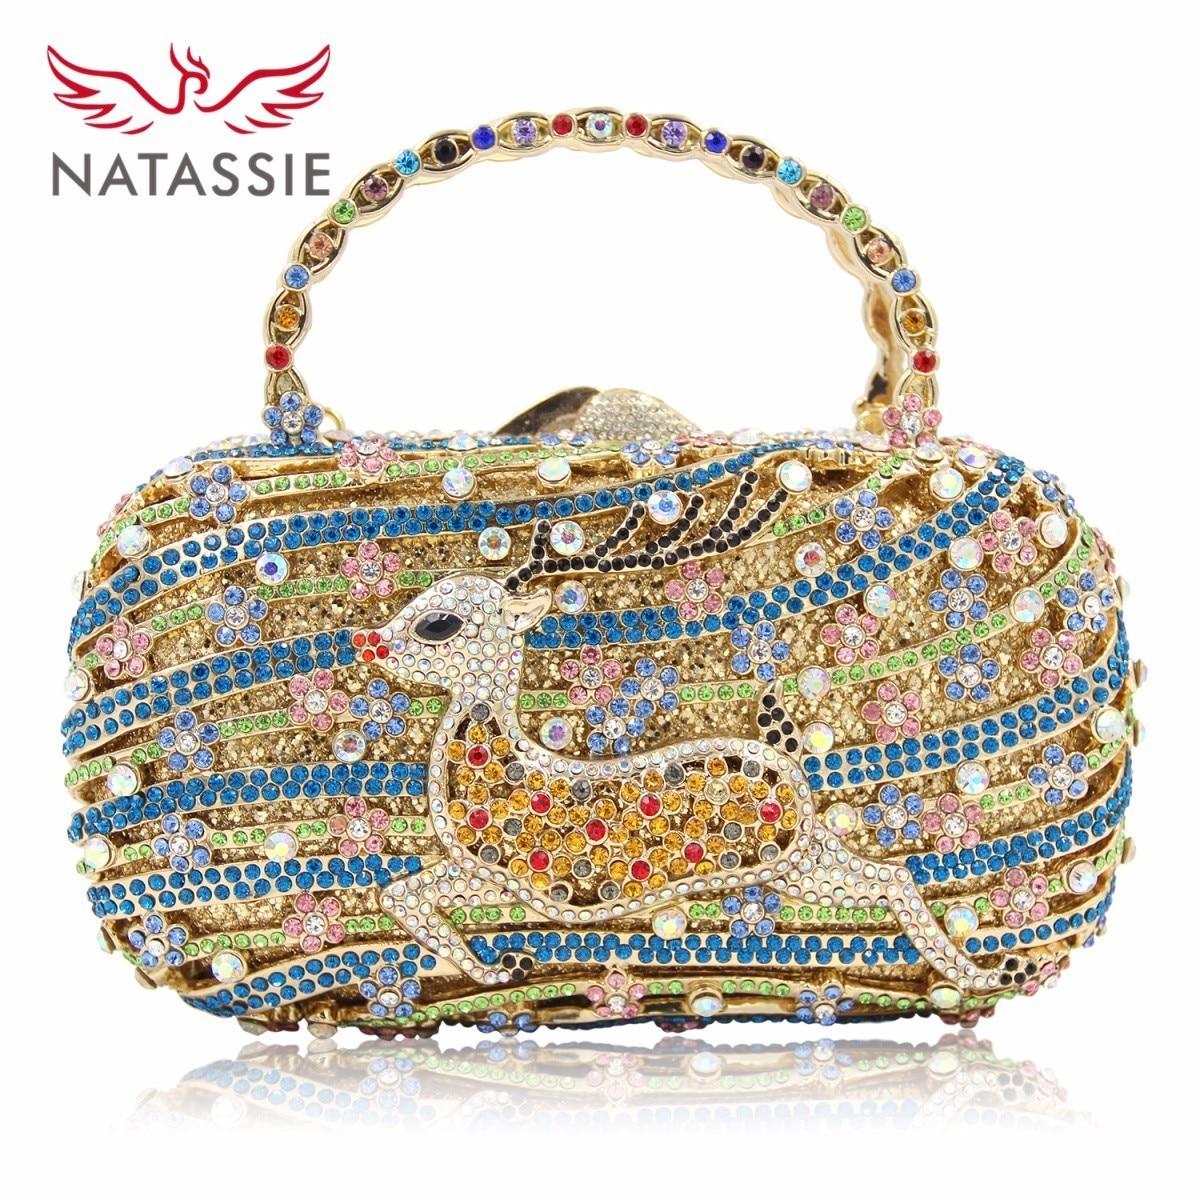 NATASSIE Exquisite Sika Deer Crystal Clutch Long Chain Multi Flower Color Handbag Ladies Meeting Purses Girls Party Bag